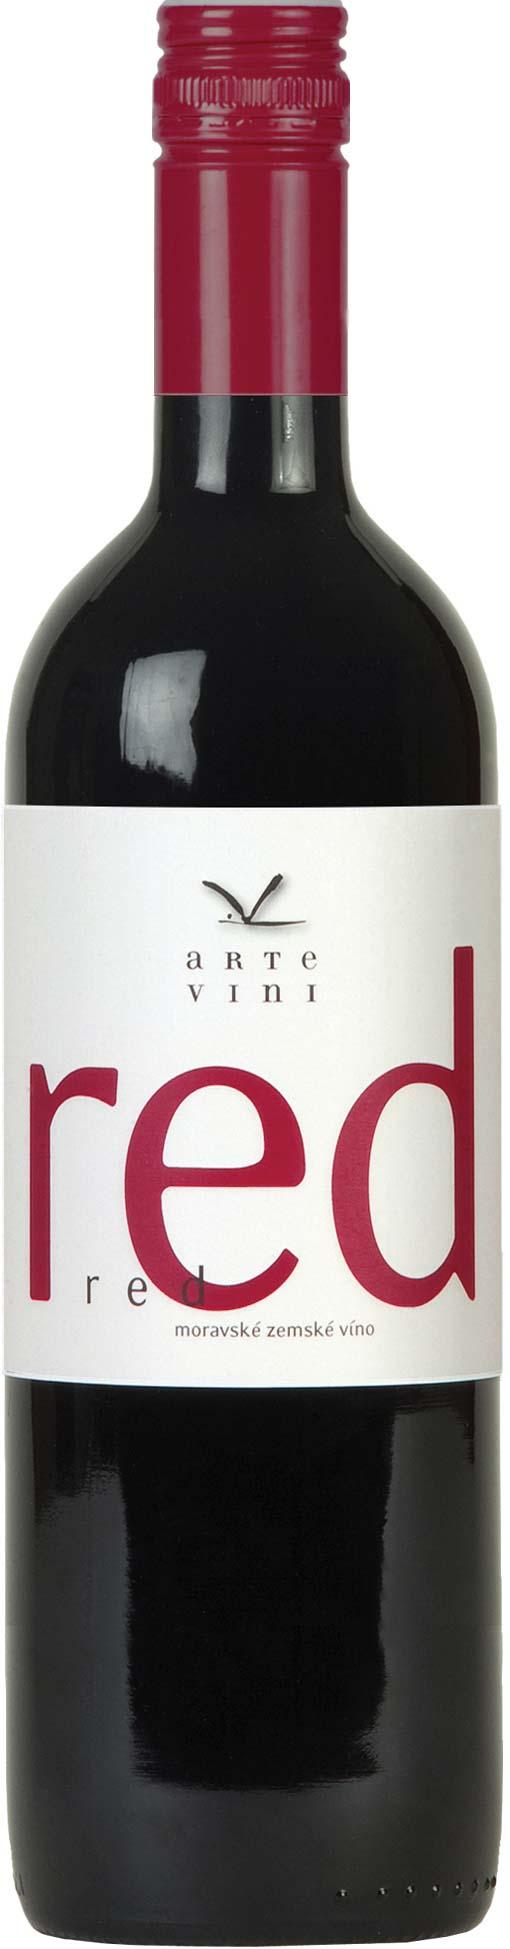 ARTE VINI - red